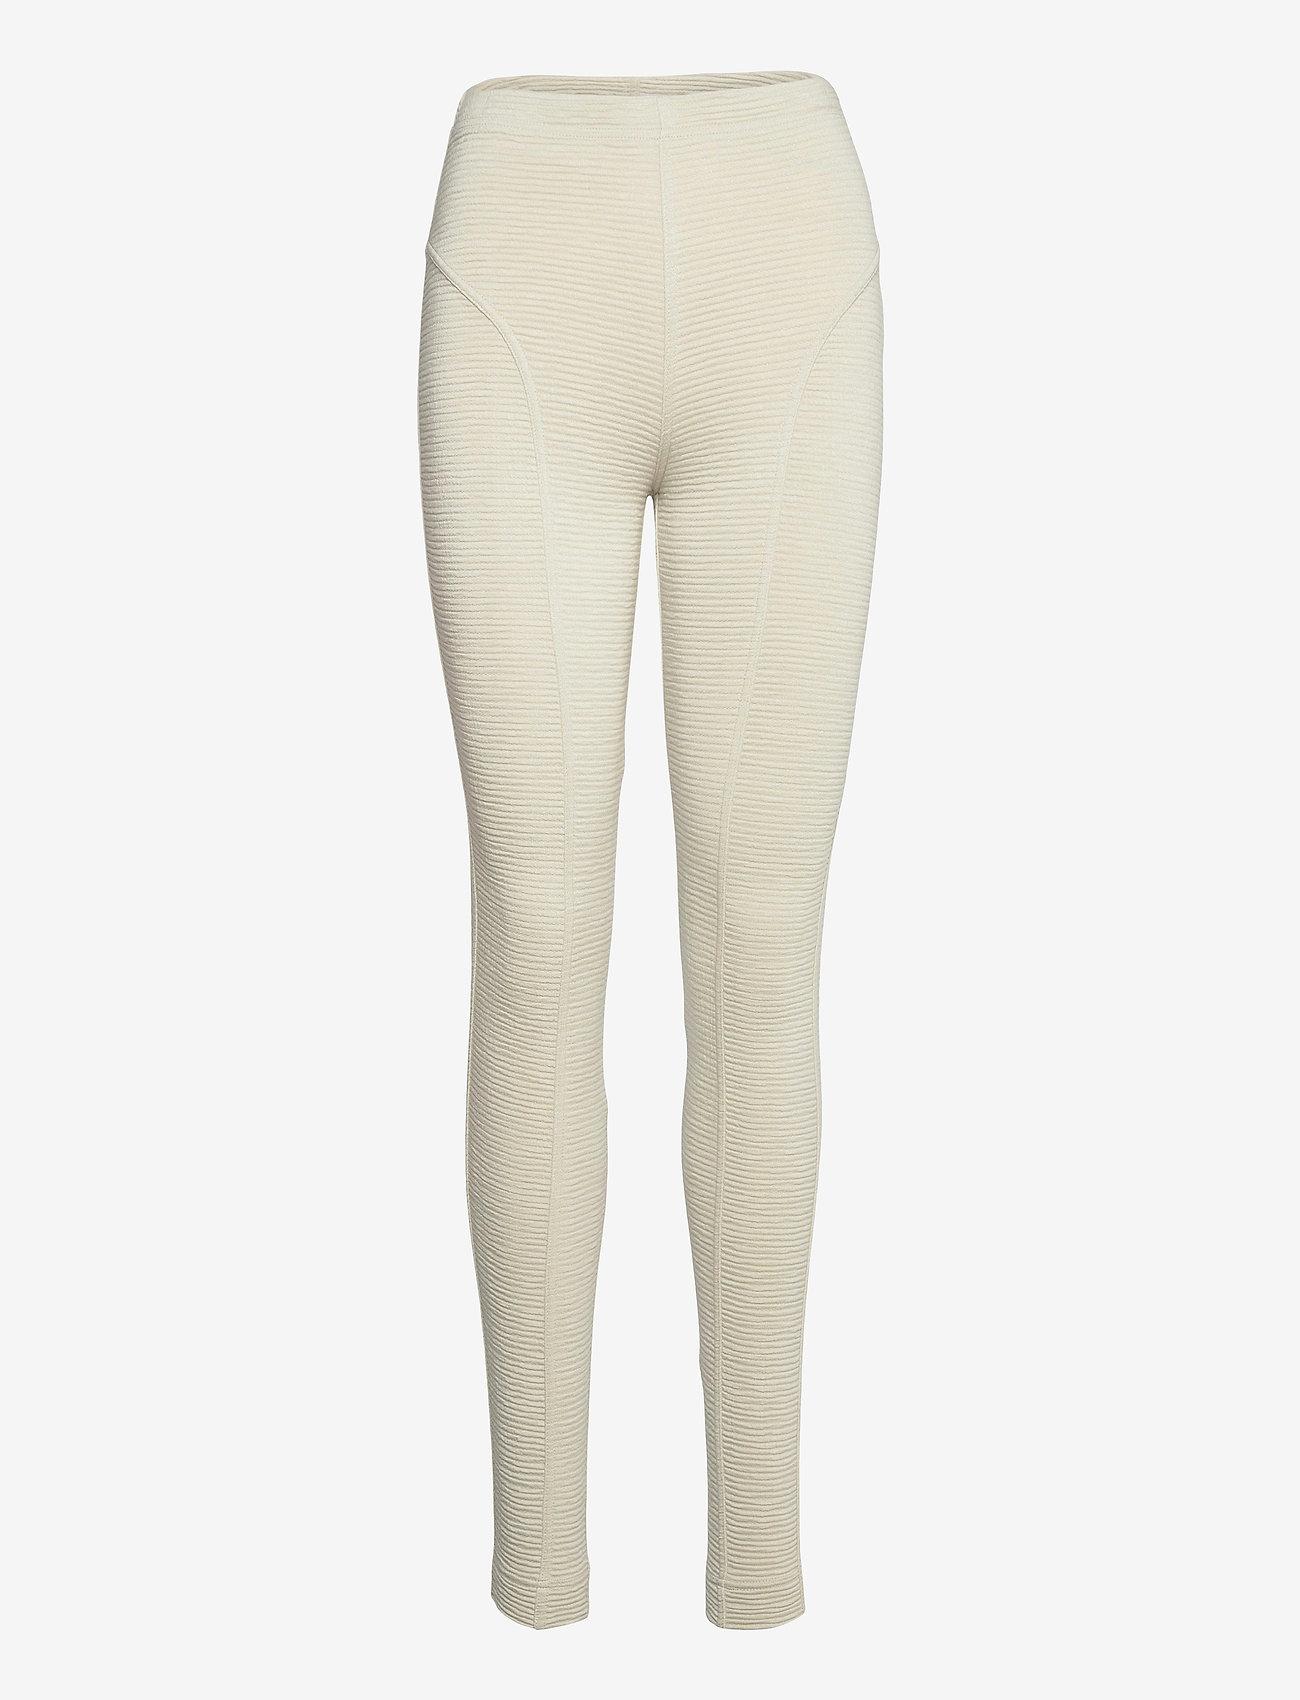 REMAIN Birger Christensen - Marisa Tights - leggings - pelican - 1